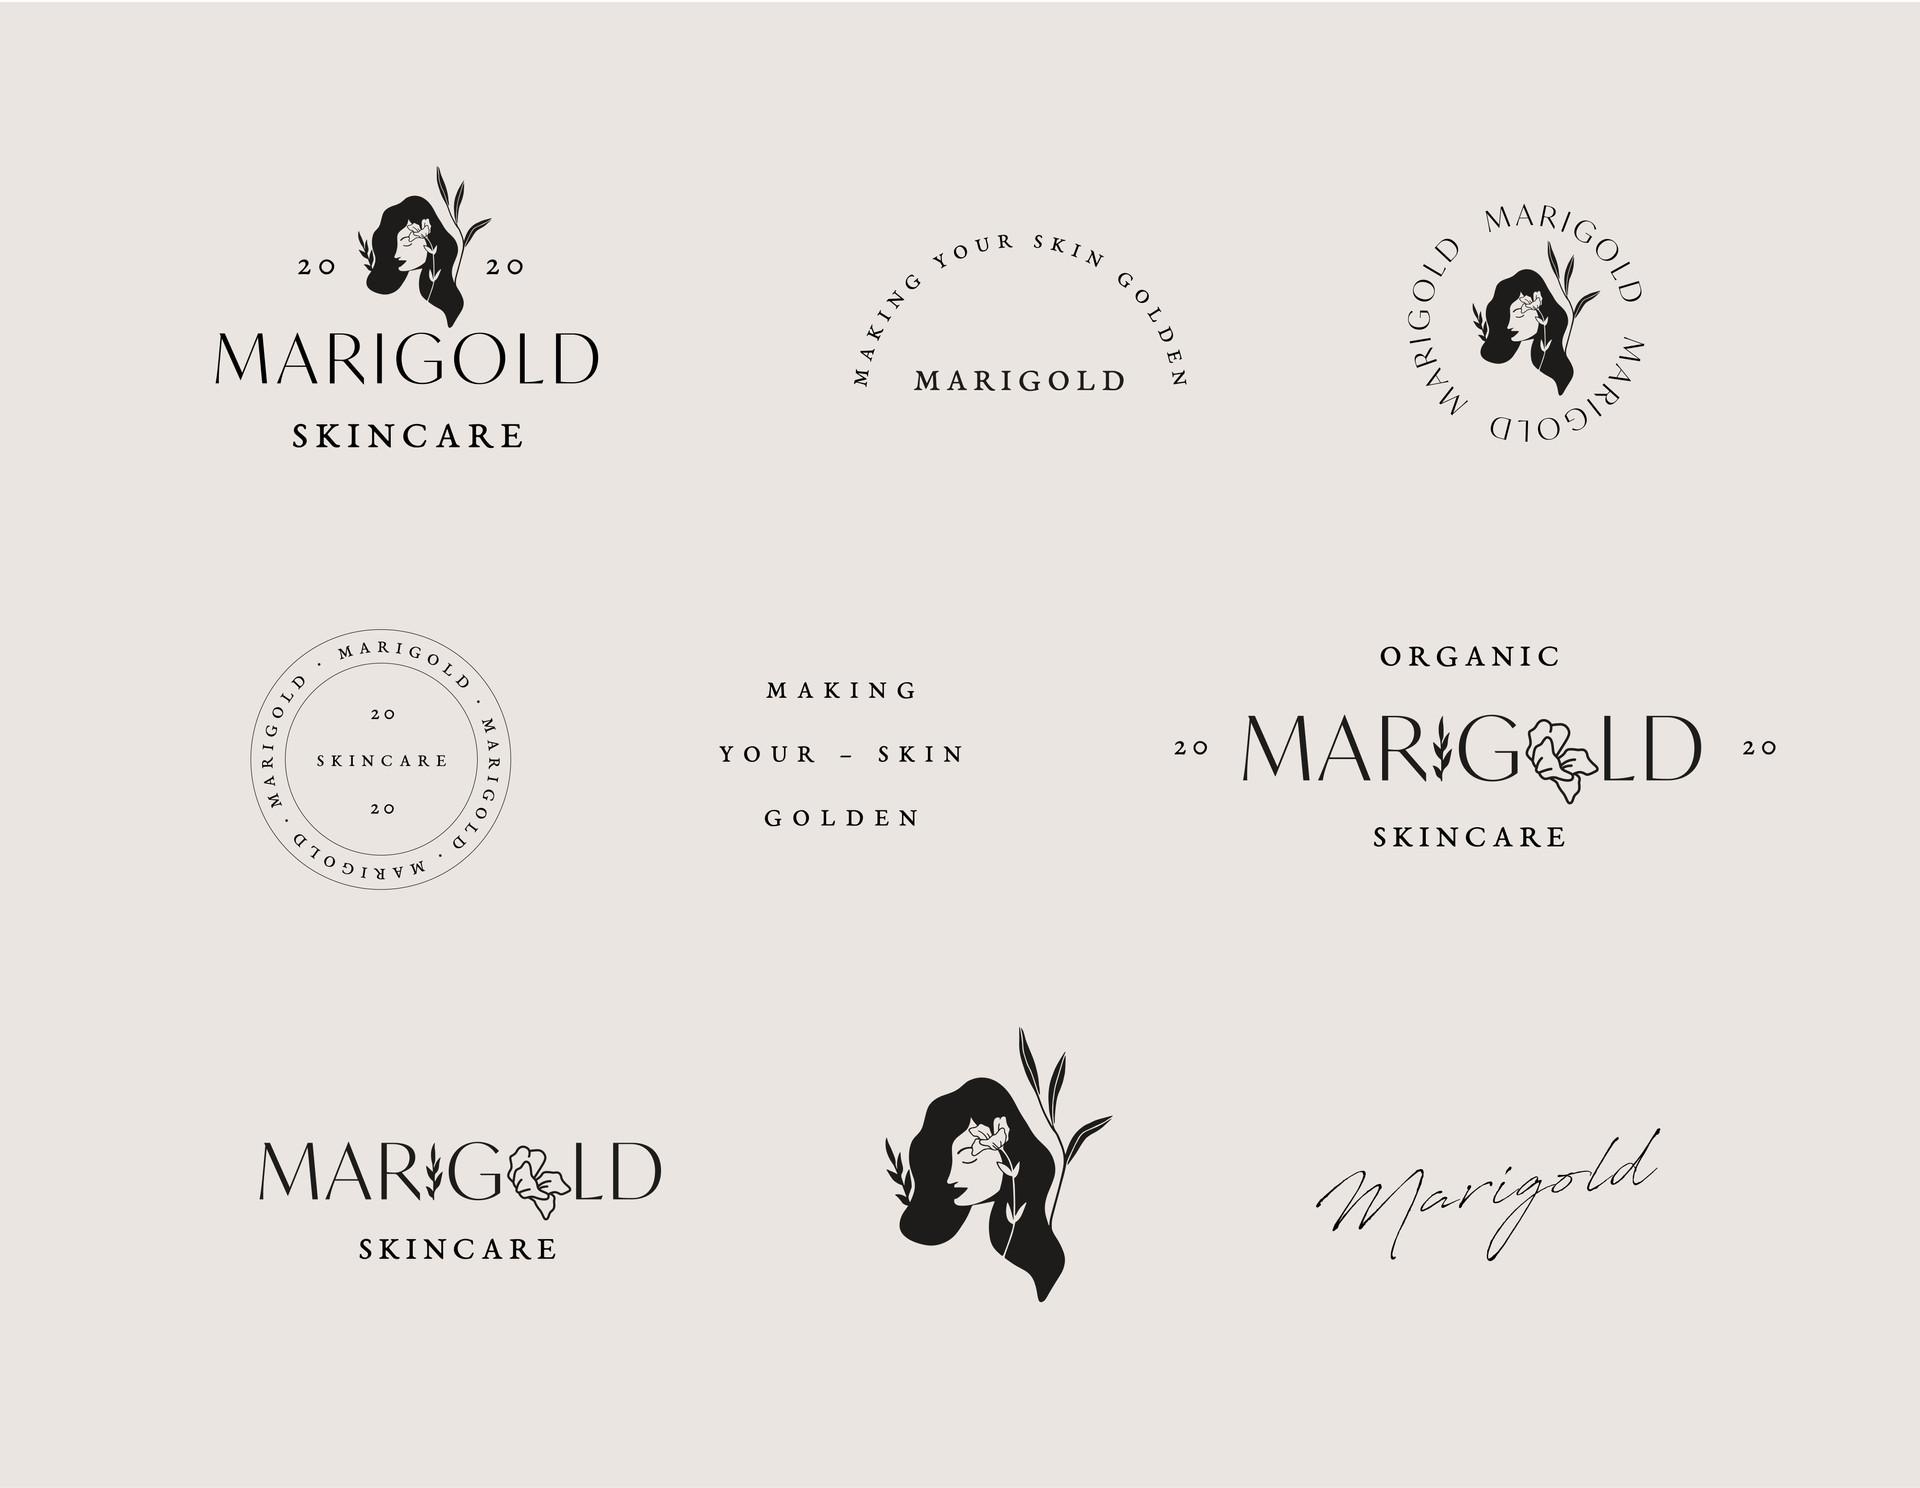 Marigold-BrandingBoard_02-09.jpg